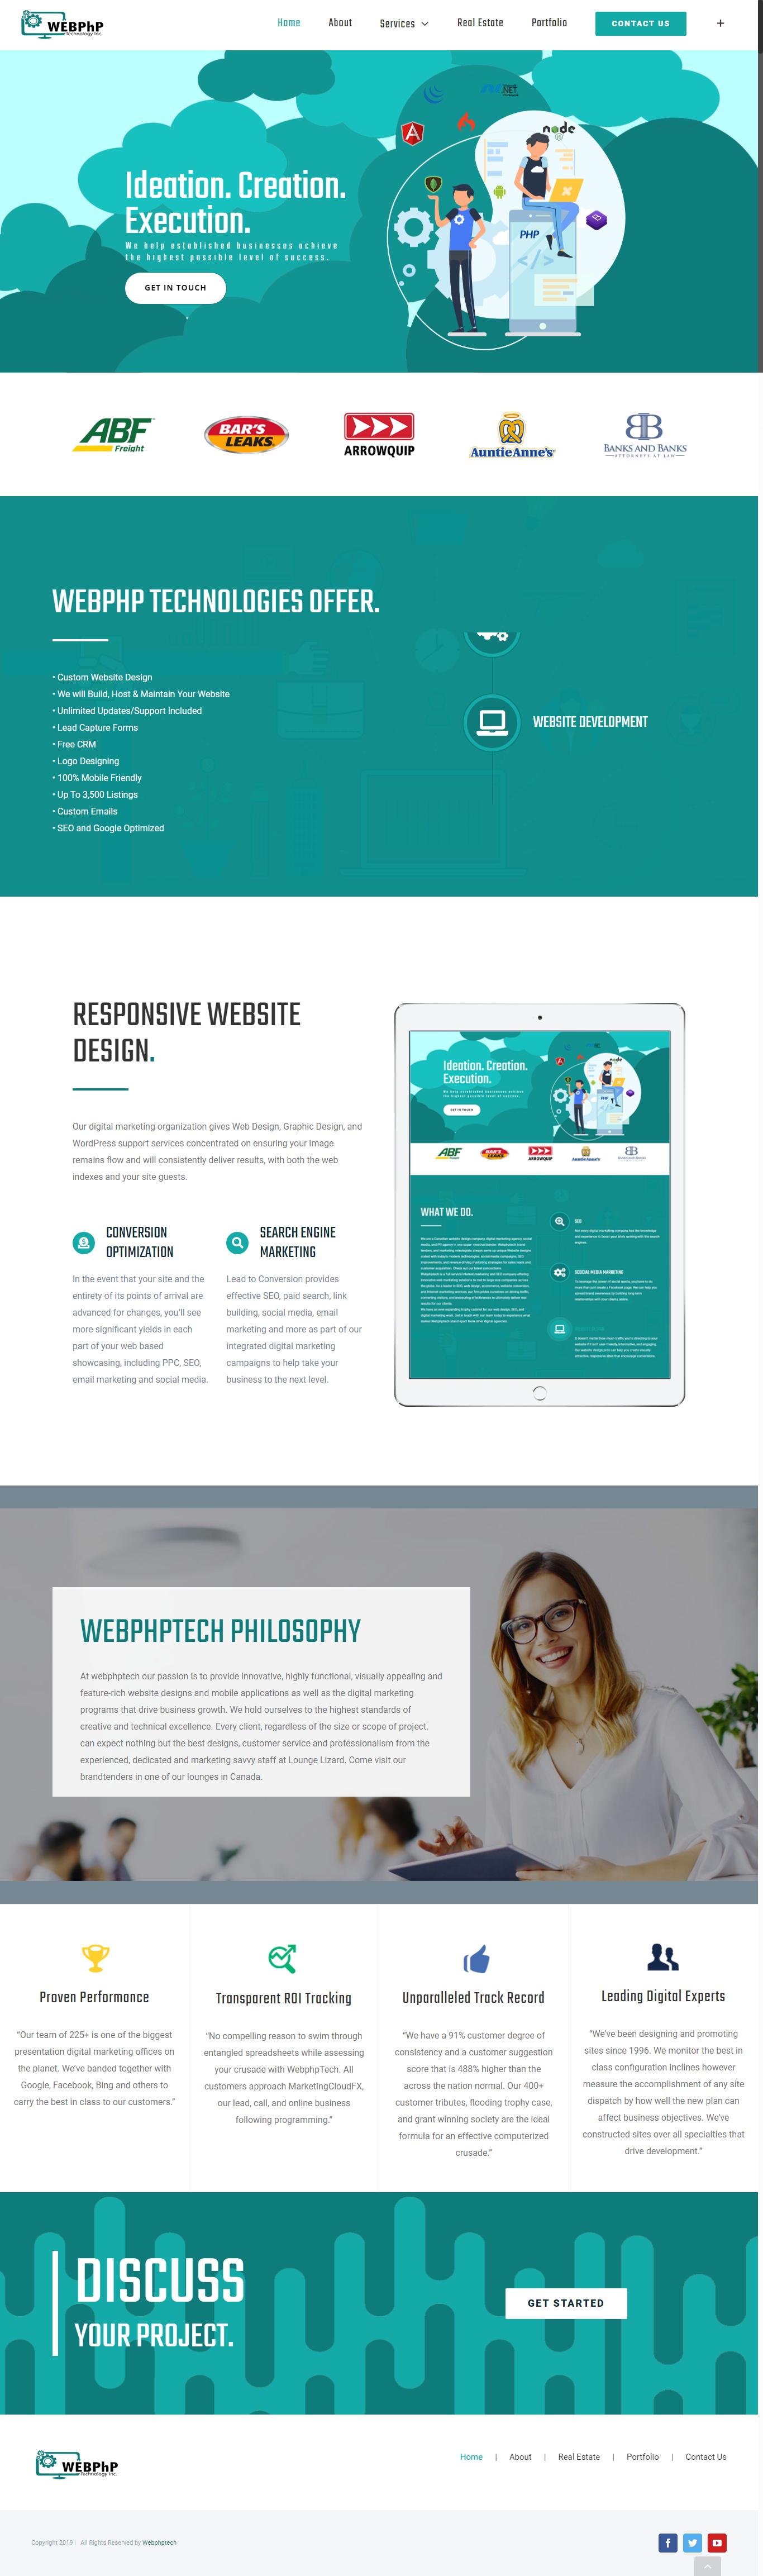 webphptech portfolio image